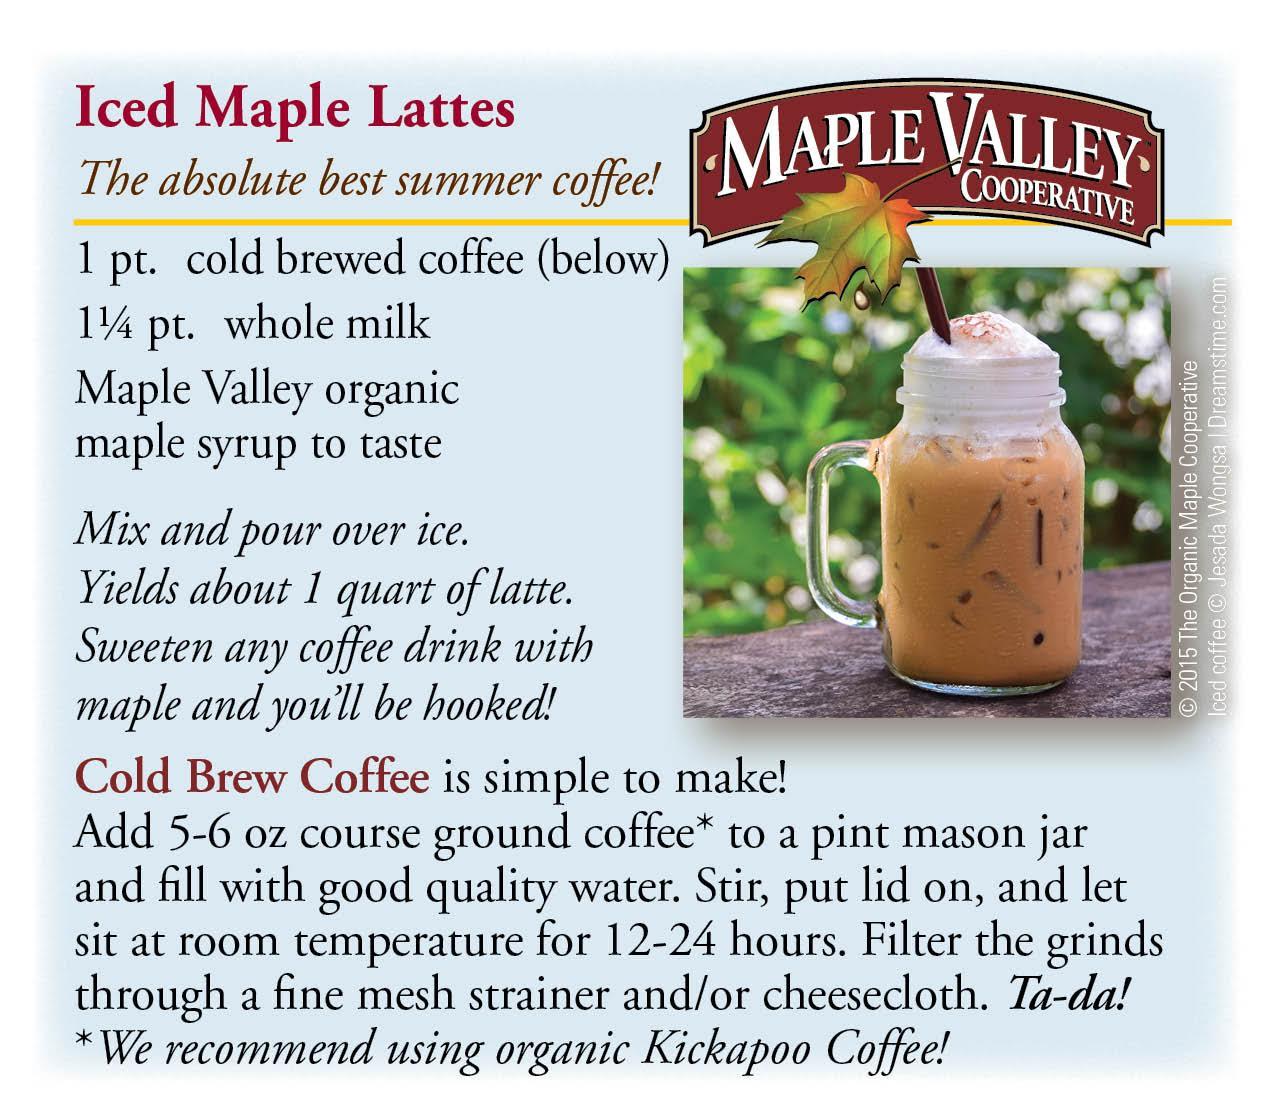 iced_maple_latte